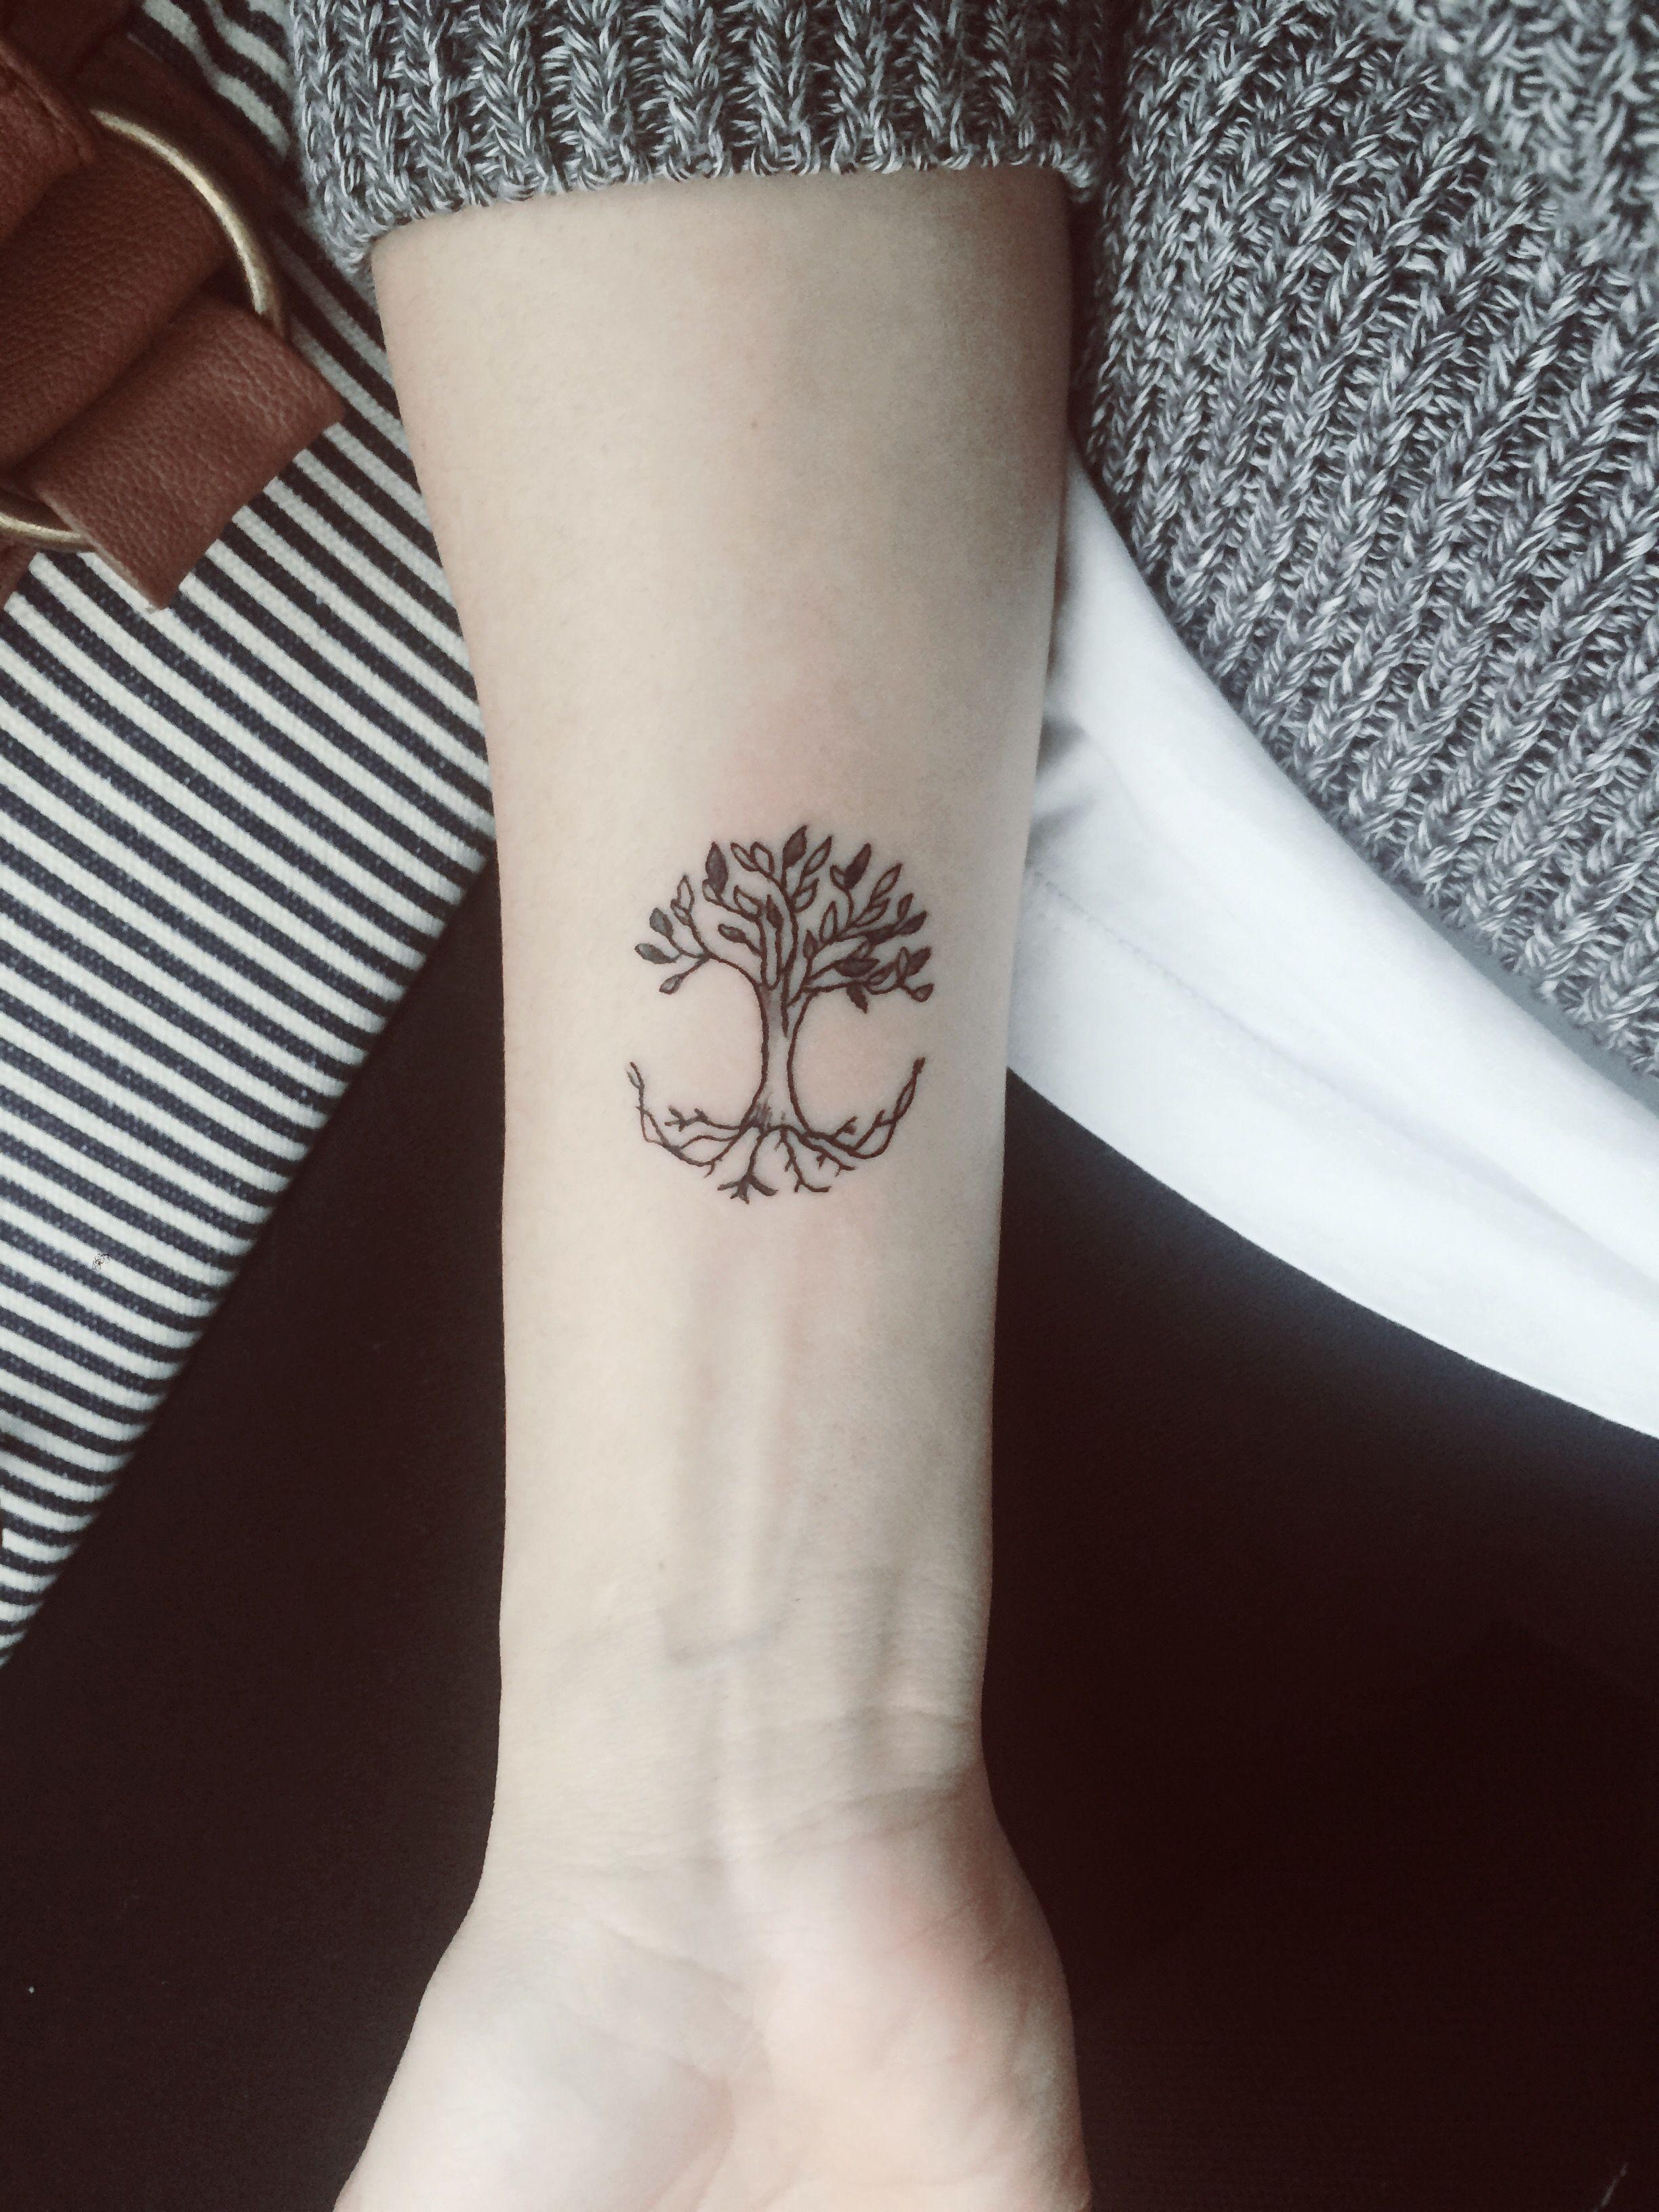 Tree Of Life Tattoo Idea Forearm Tattoo Ink Forearmtattoo